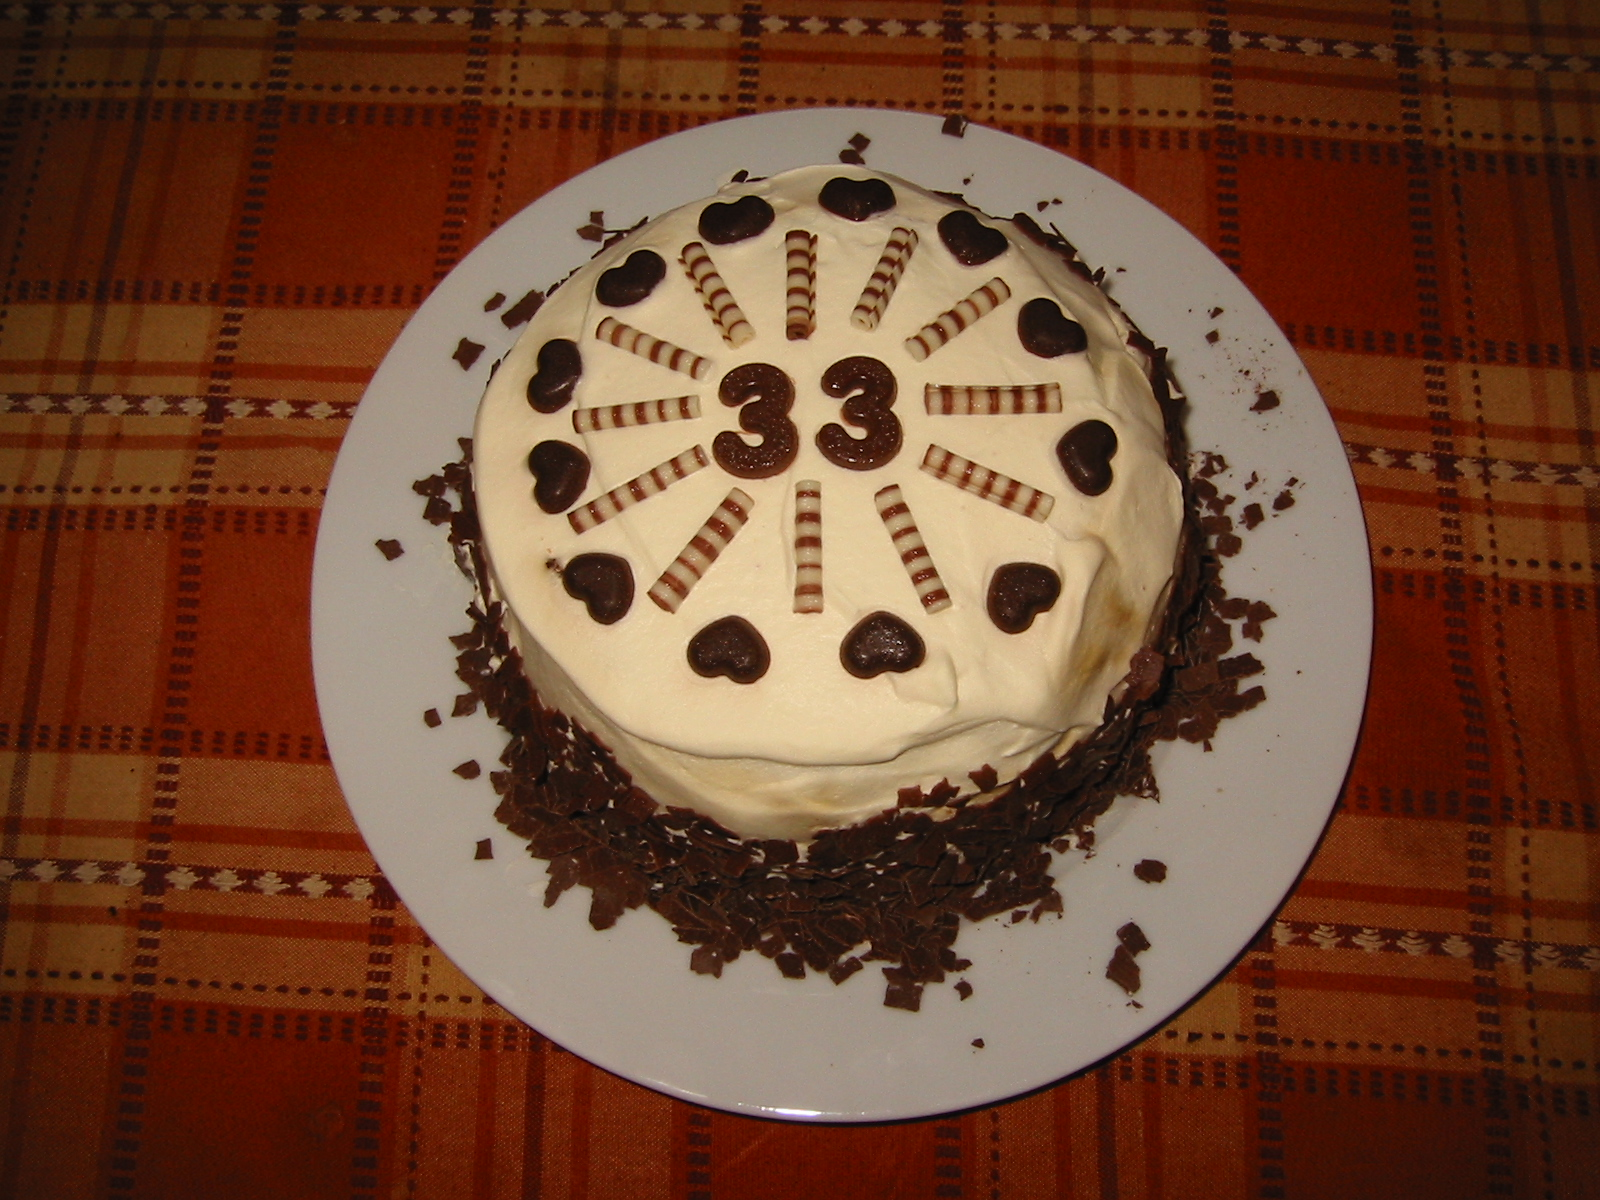 33 Year Old Birthday Cakes